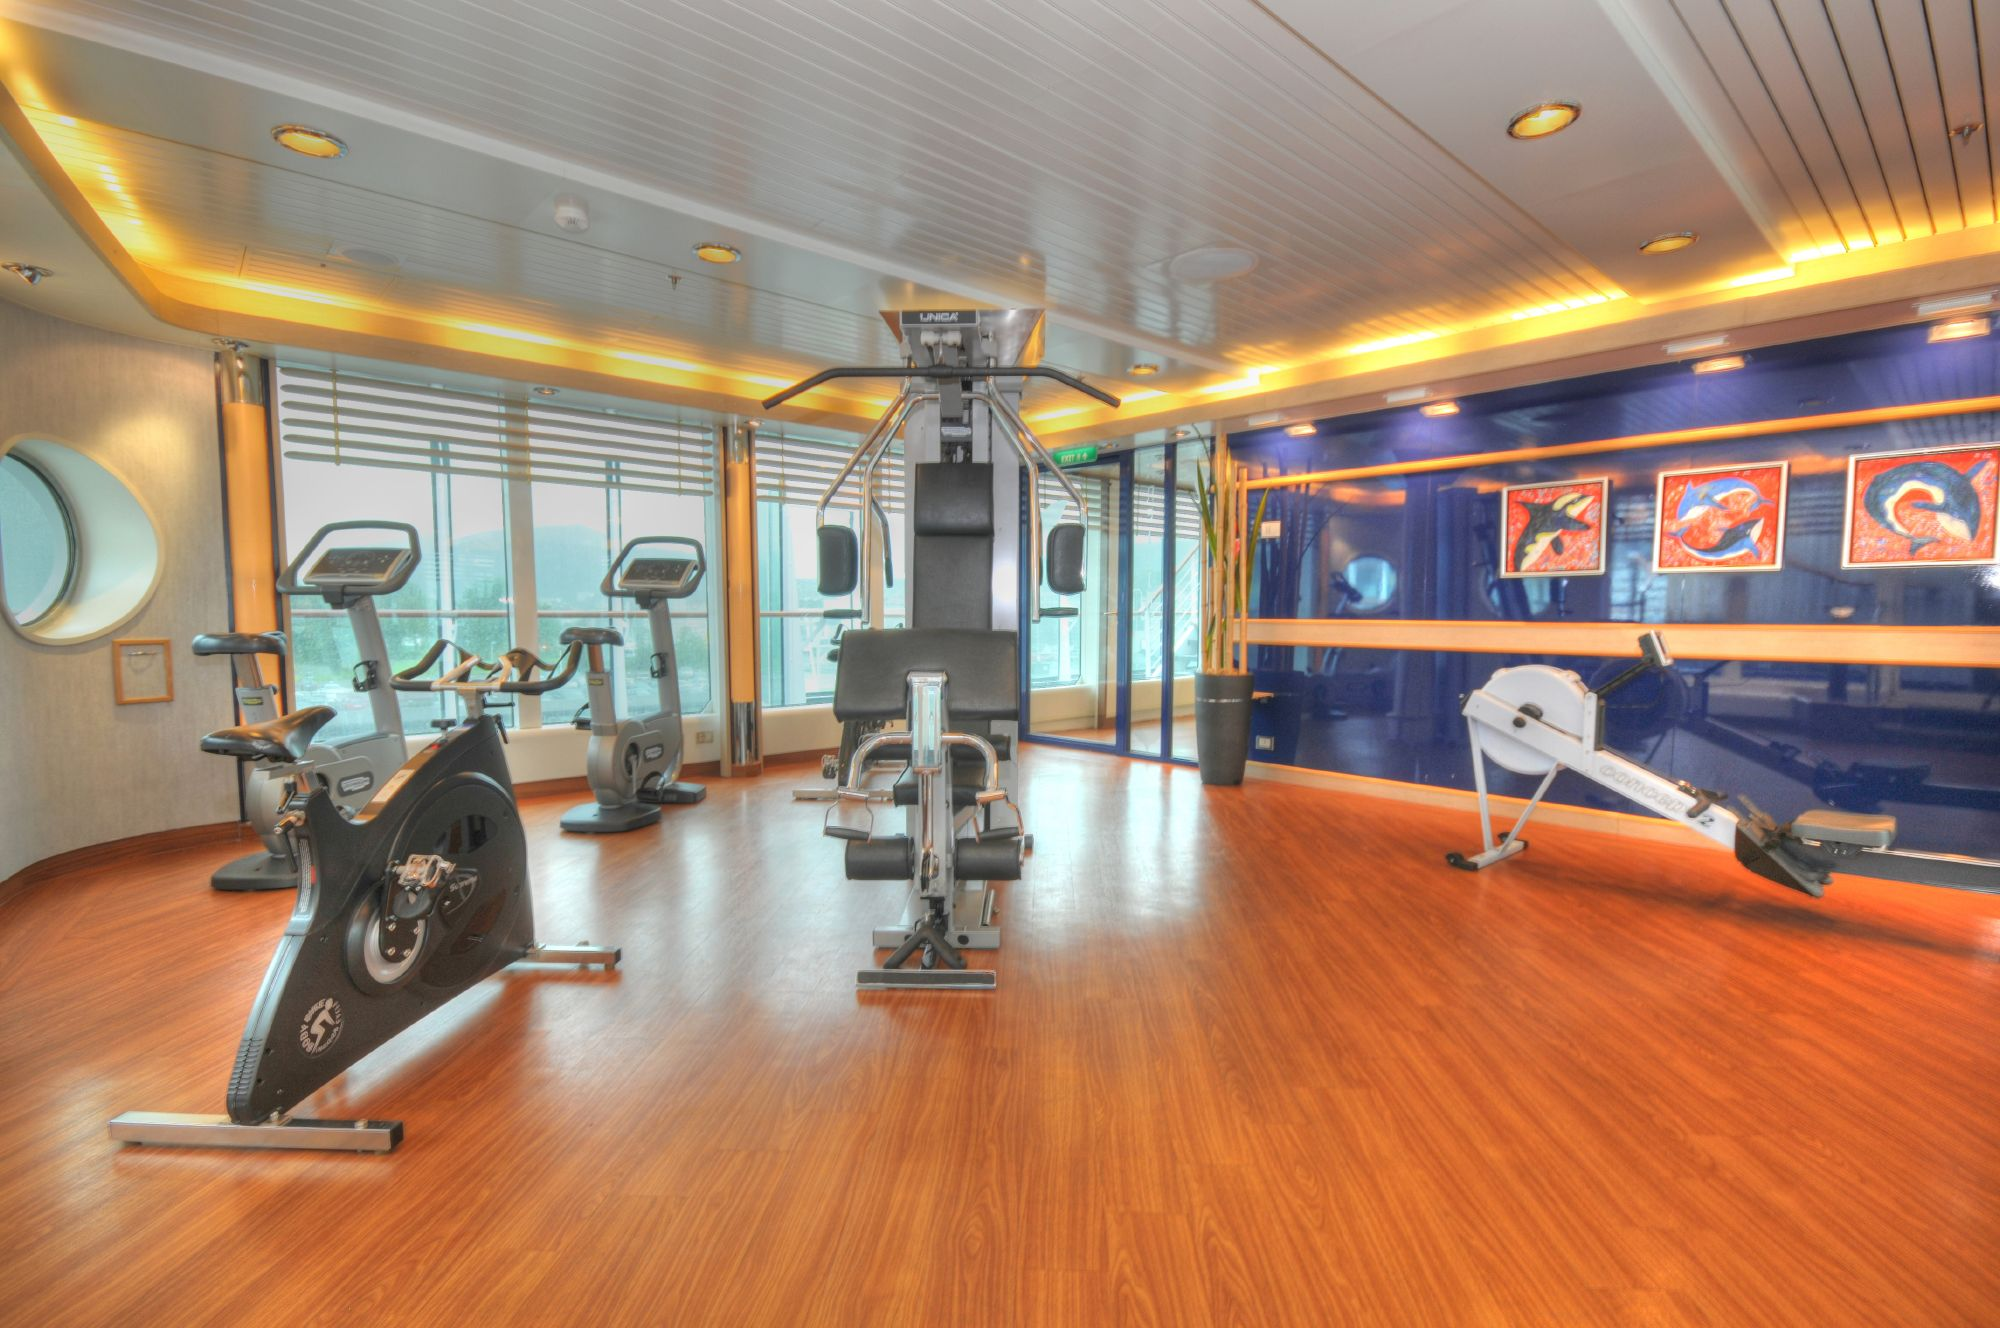 Hurtigruten Cruise Lines MS Fram Interior Fitness Room 3.jpg